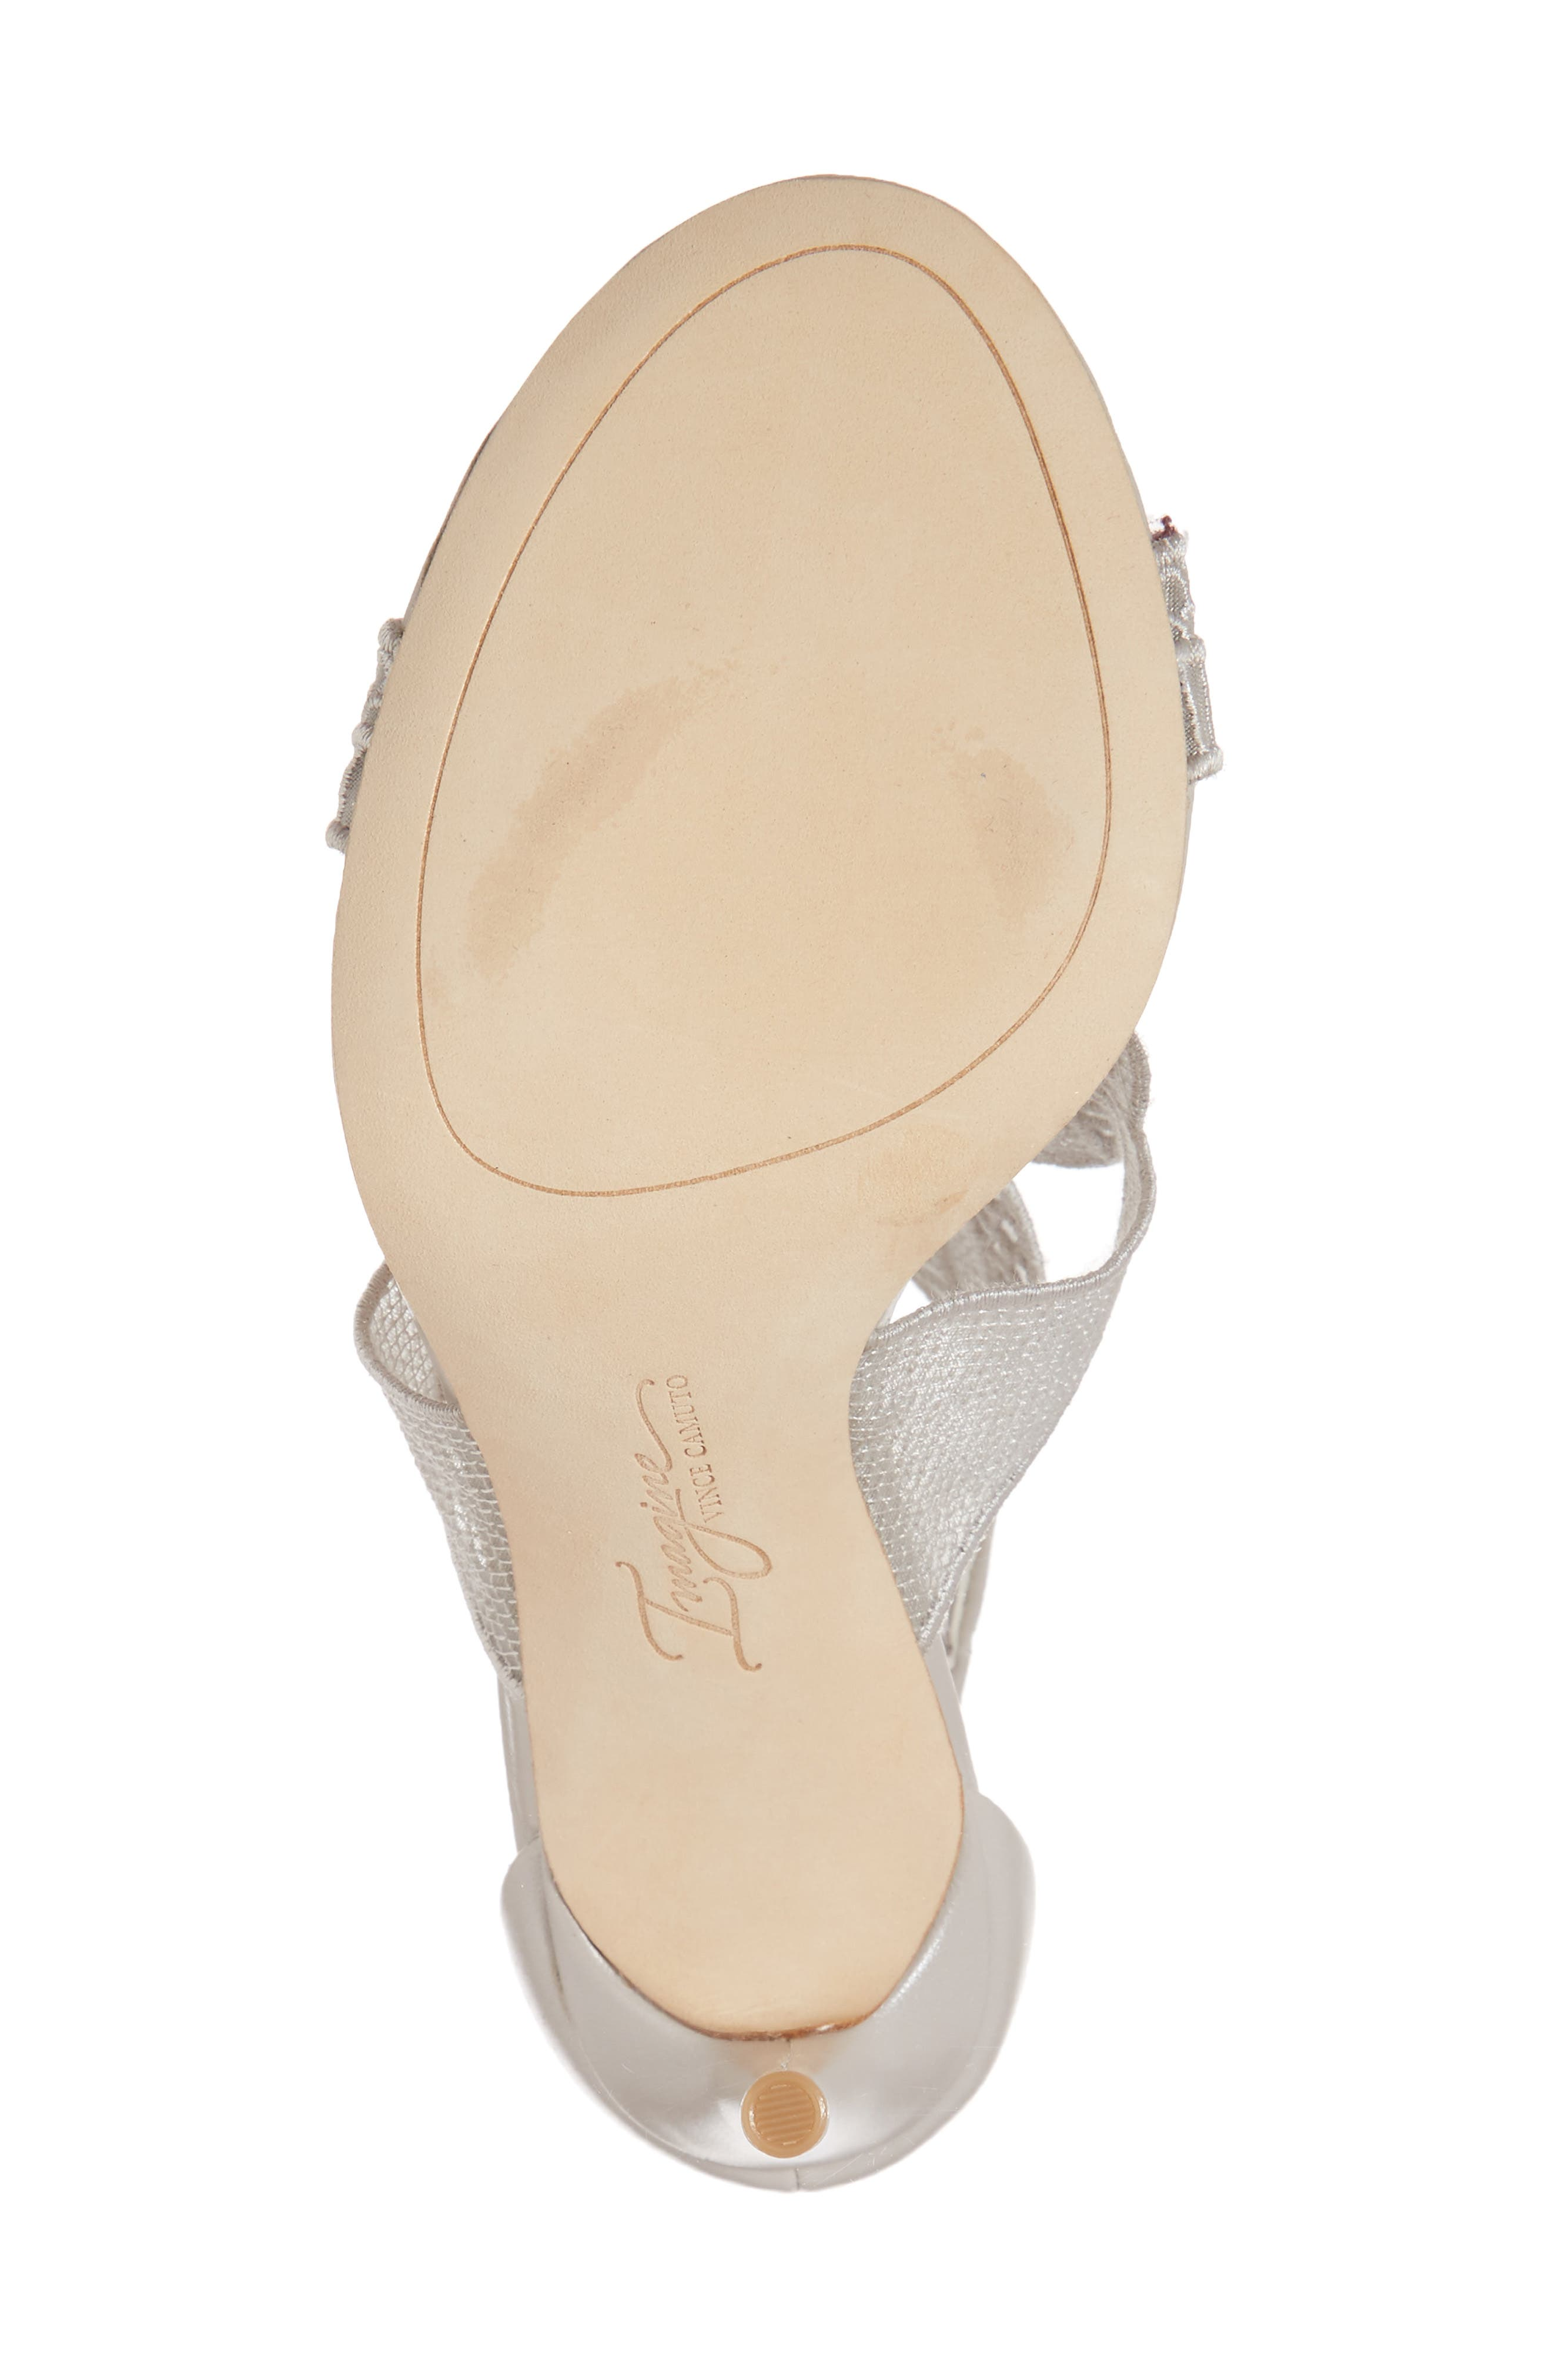 Rashi Sandal,                             Alternate thumbnail 6, color,                             Grey Mist Leather